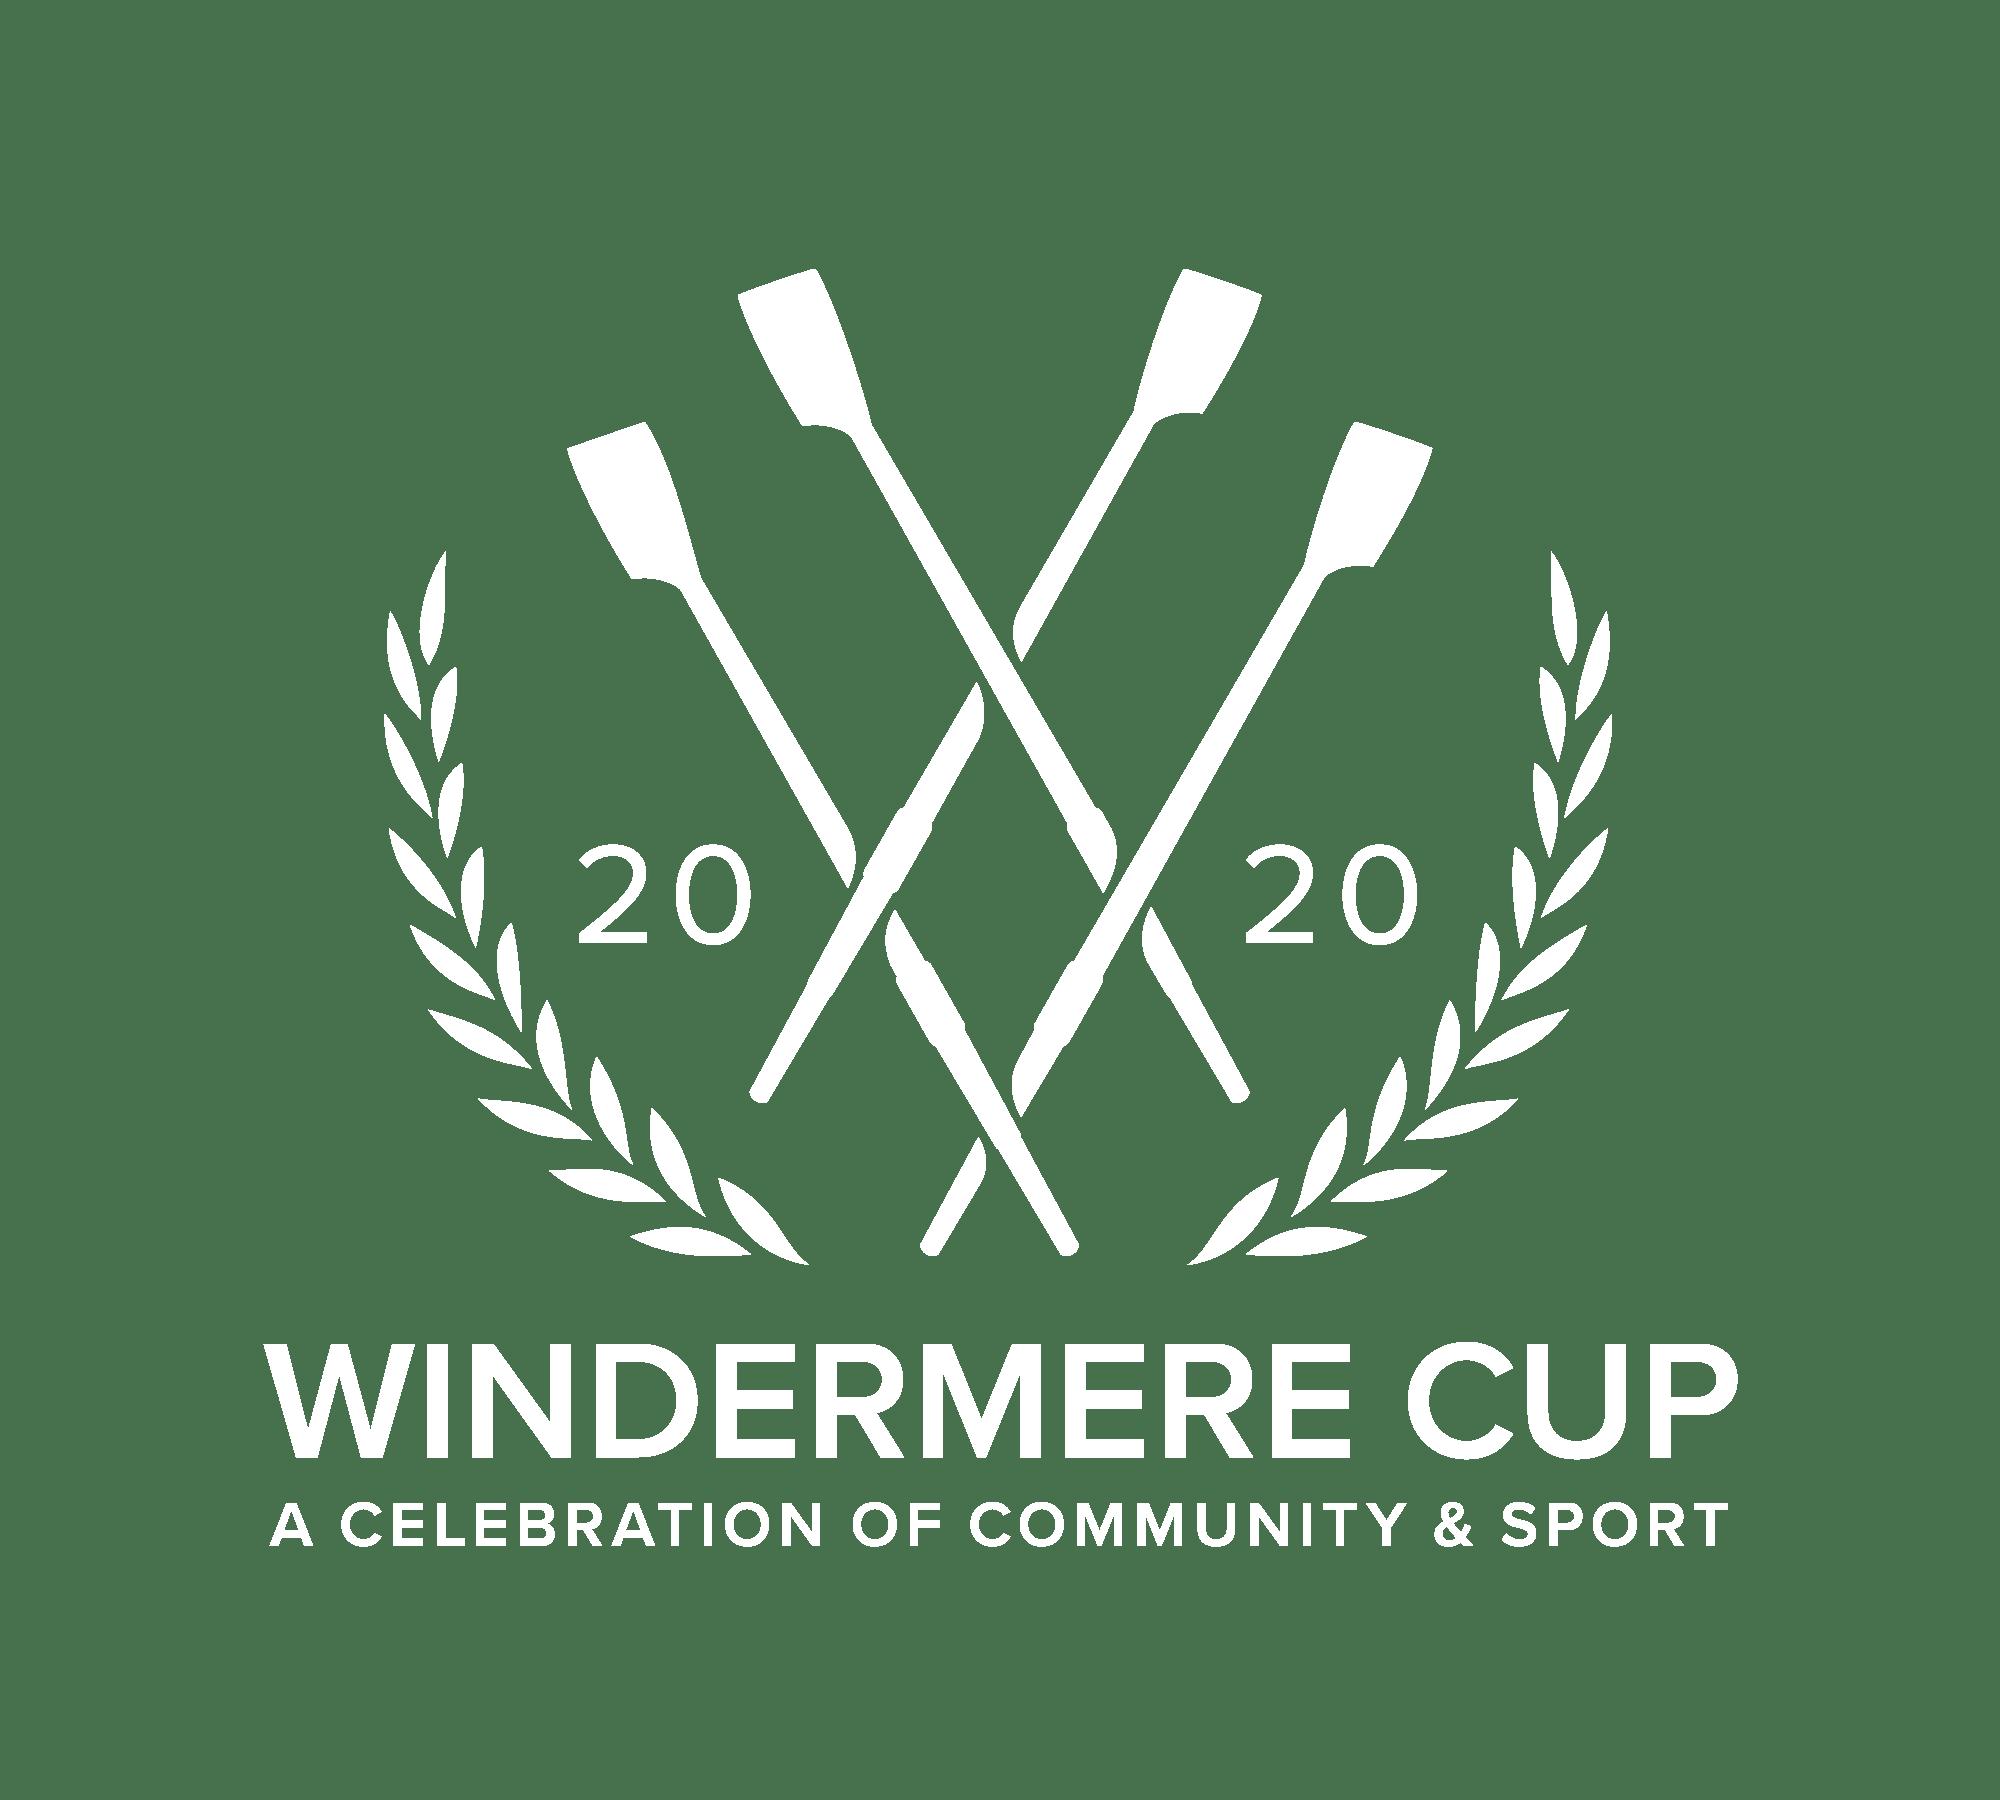 Windermere-Cup-Logo_stacked-laurel-tagline-year_2020_REV-min